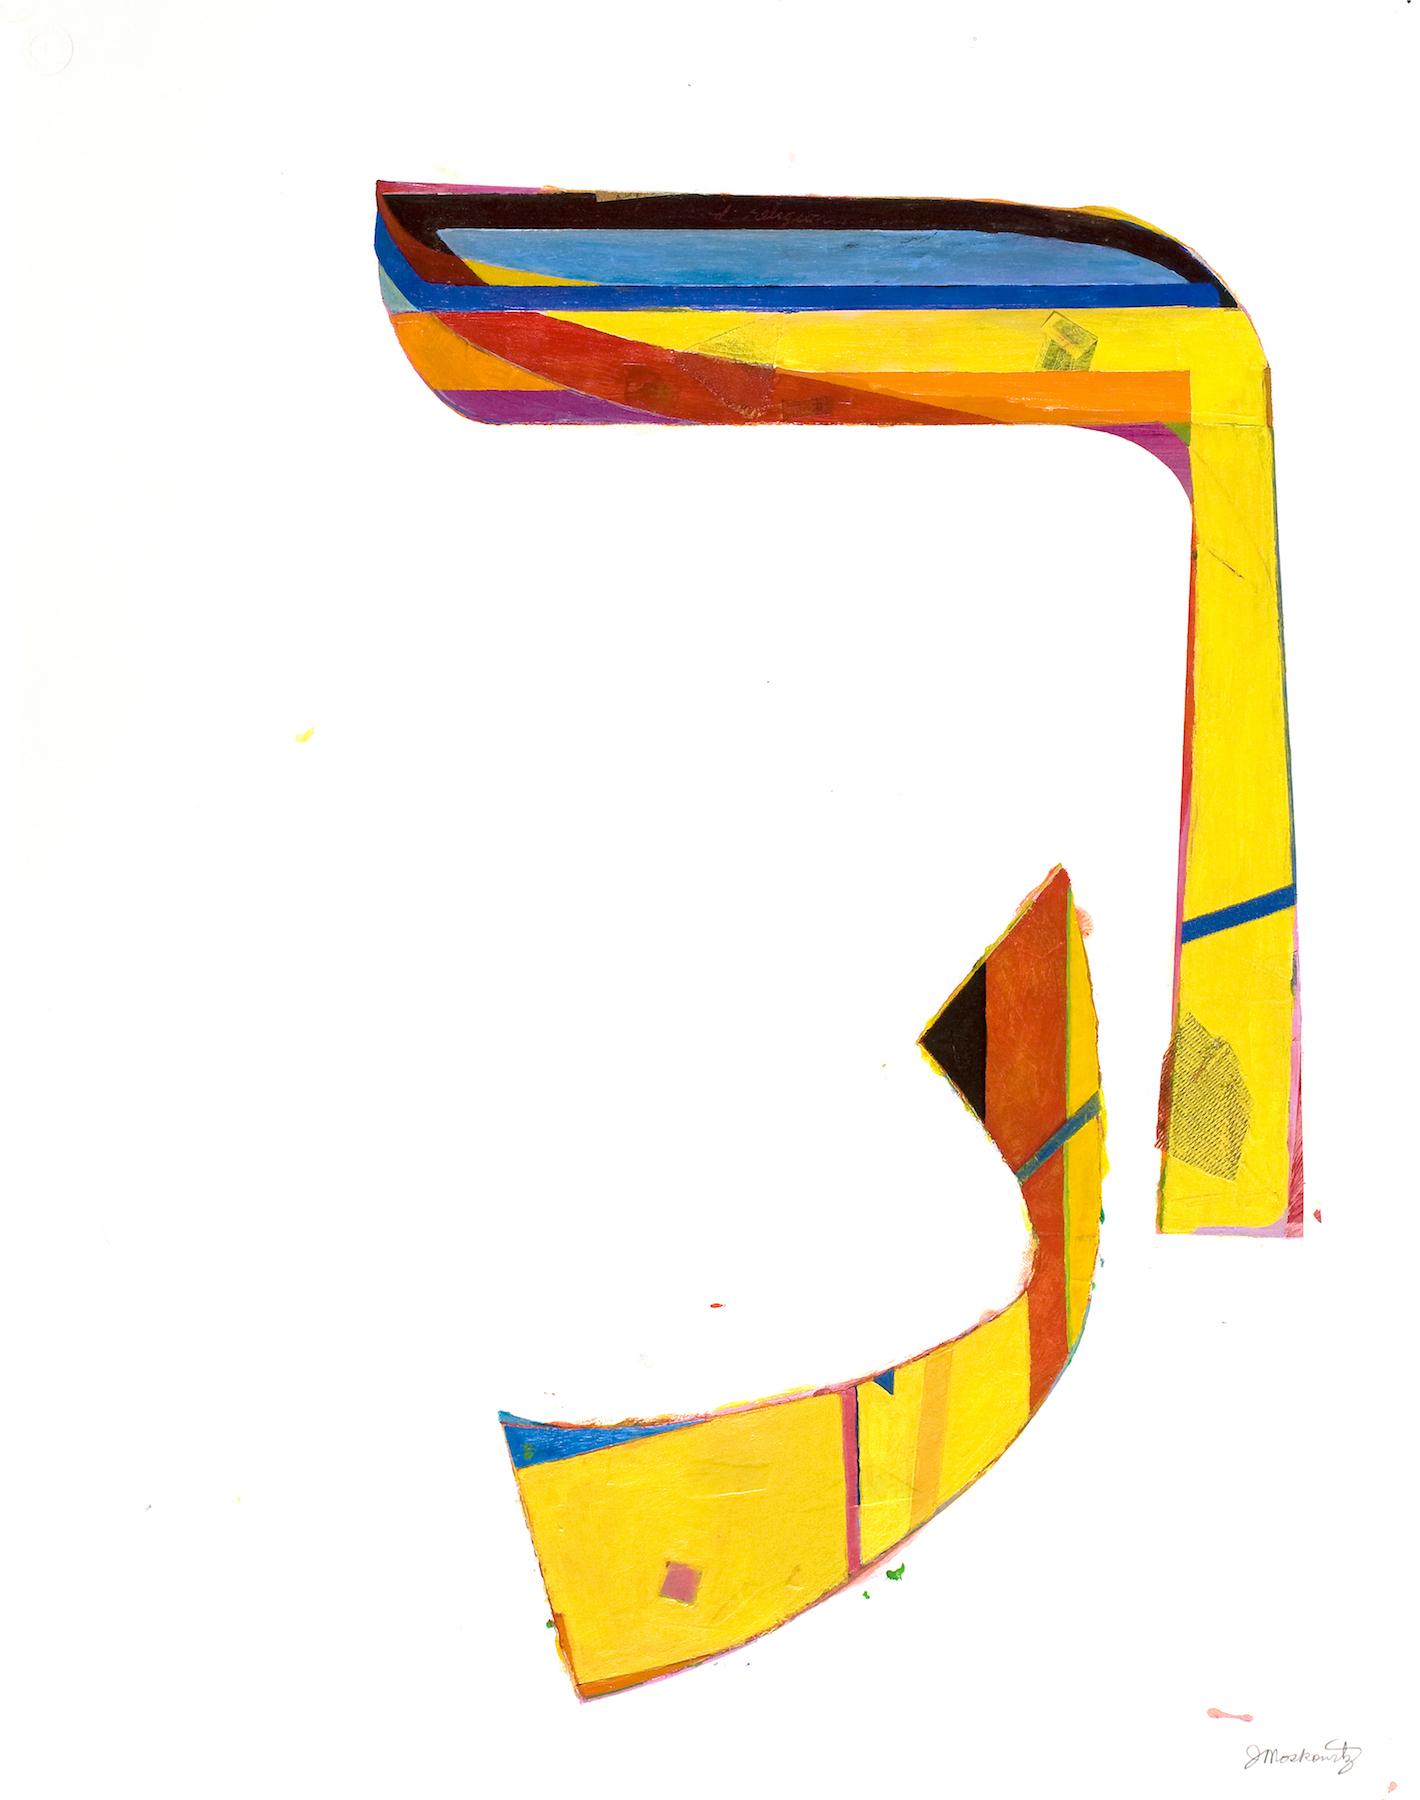 Joel Moskowitz,  Hebrew  Resh  / Arabic  Raa,    Acrylic and collage on paper, 21x29